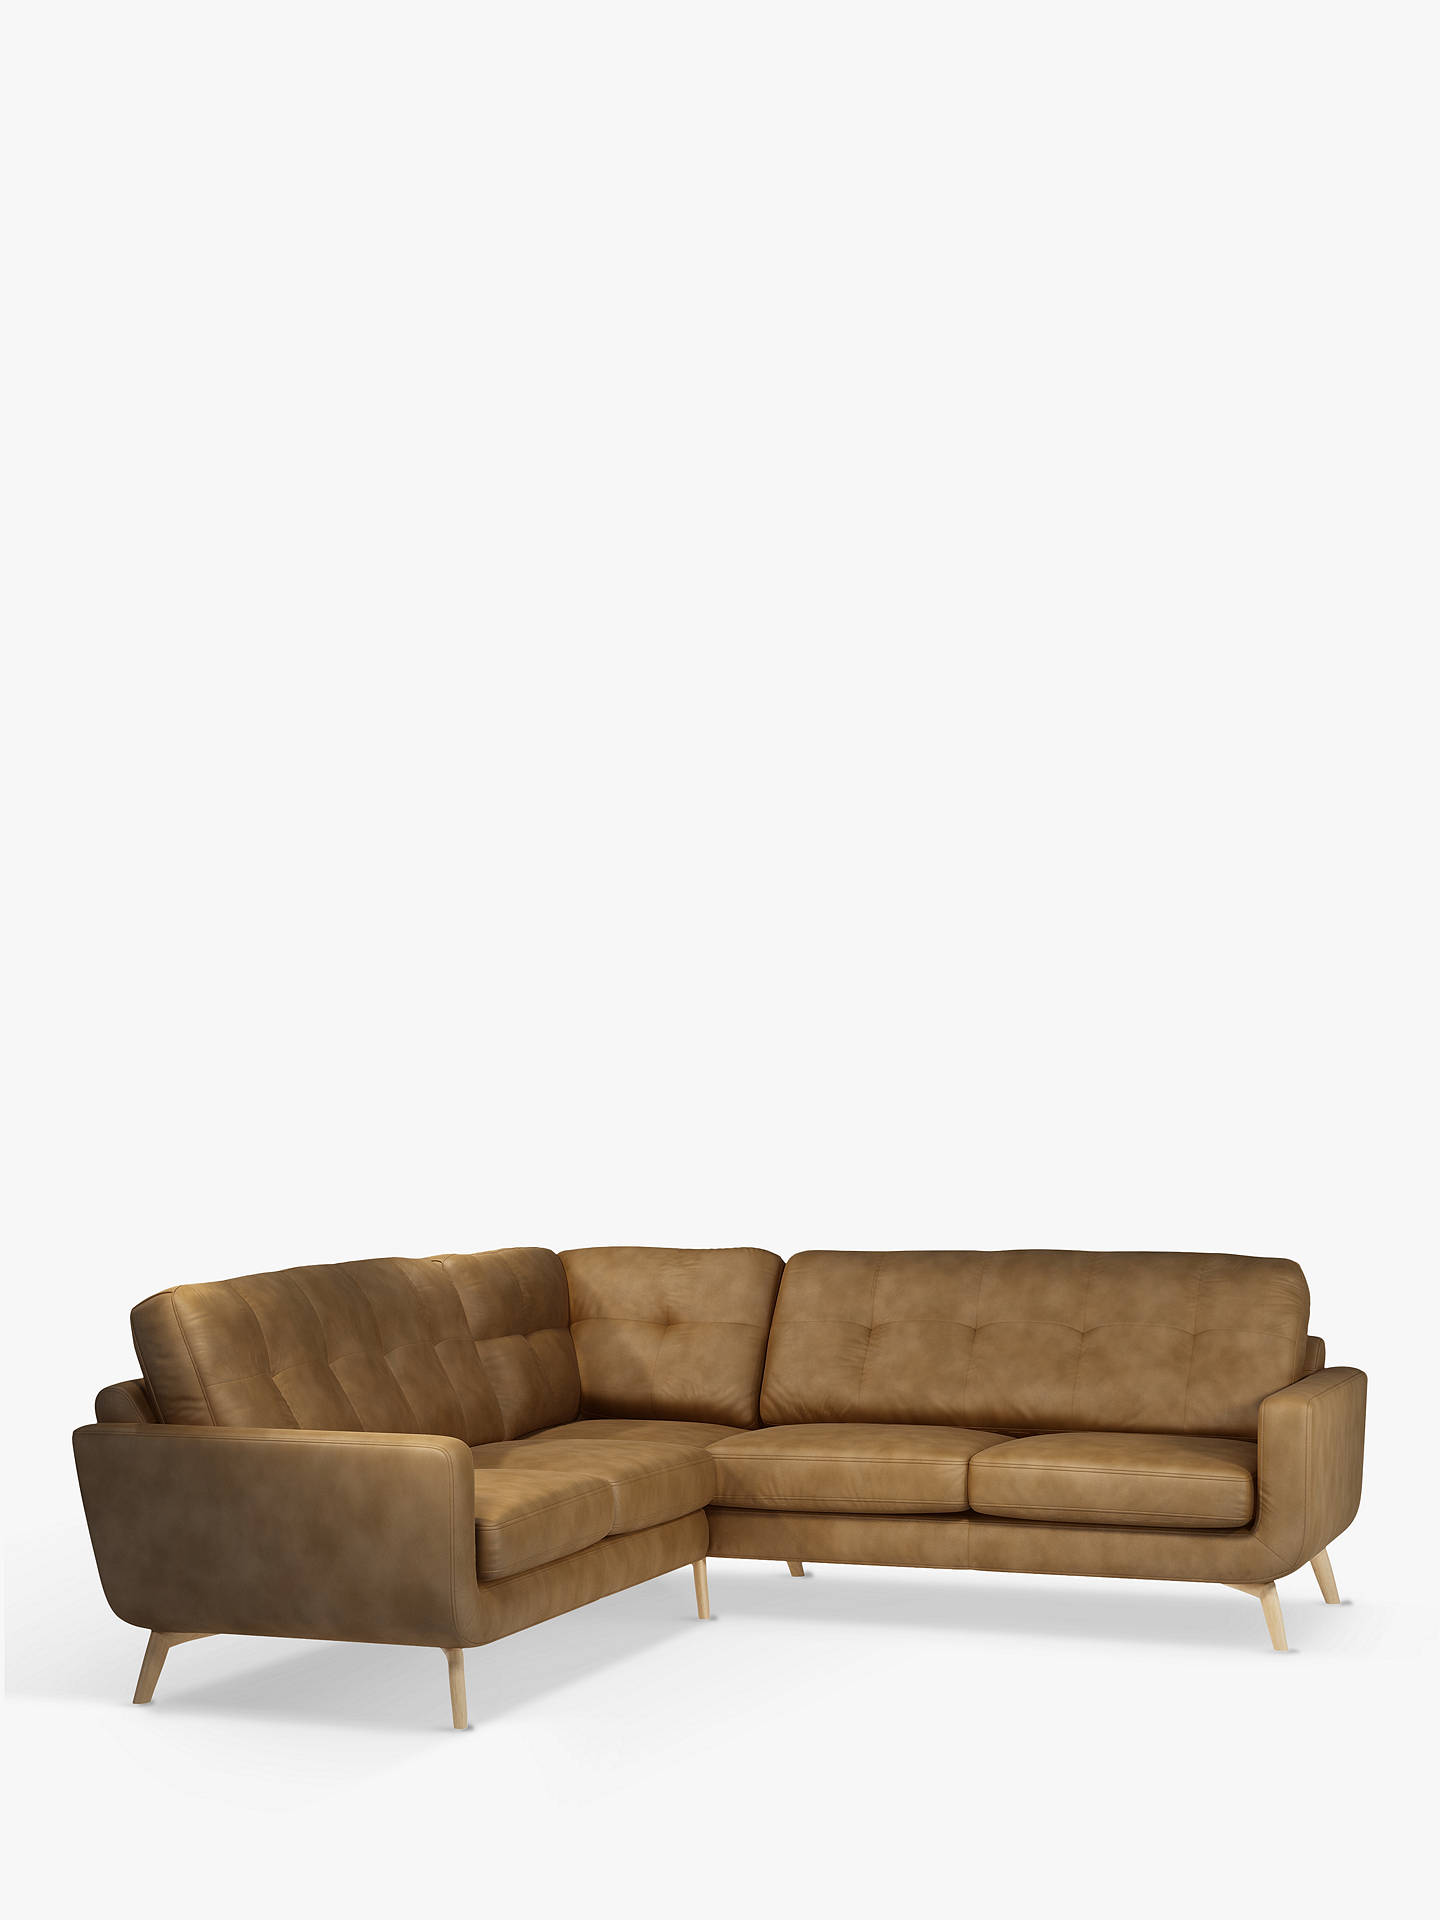 John Lewis & Partners Barbican Leather Corner Sofa, Light Leg, Demetra  Light Tan